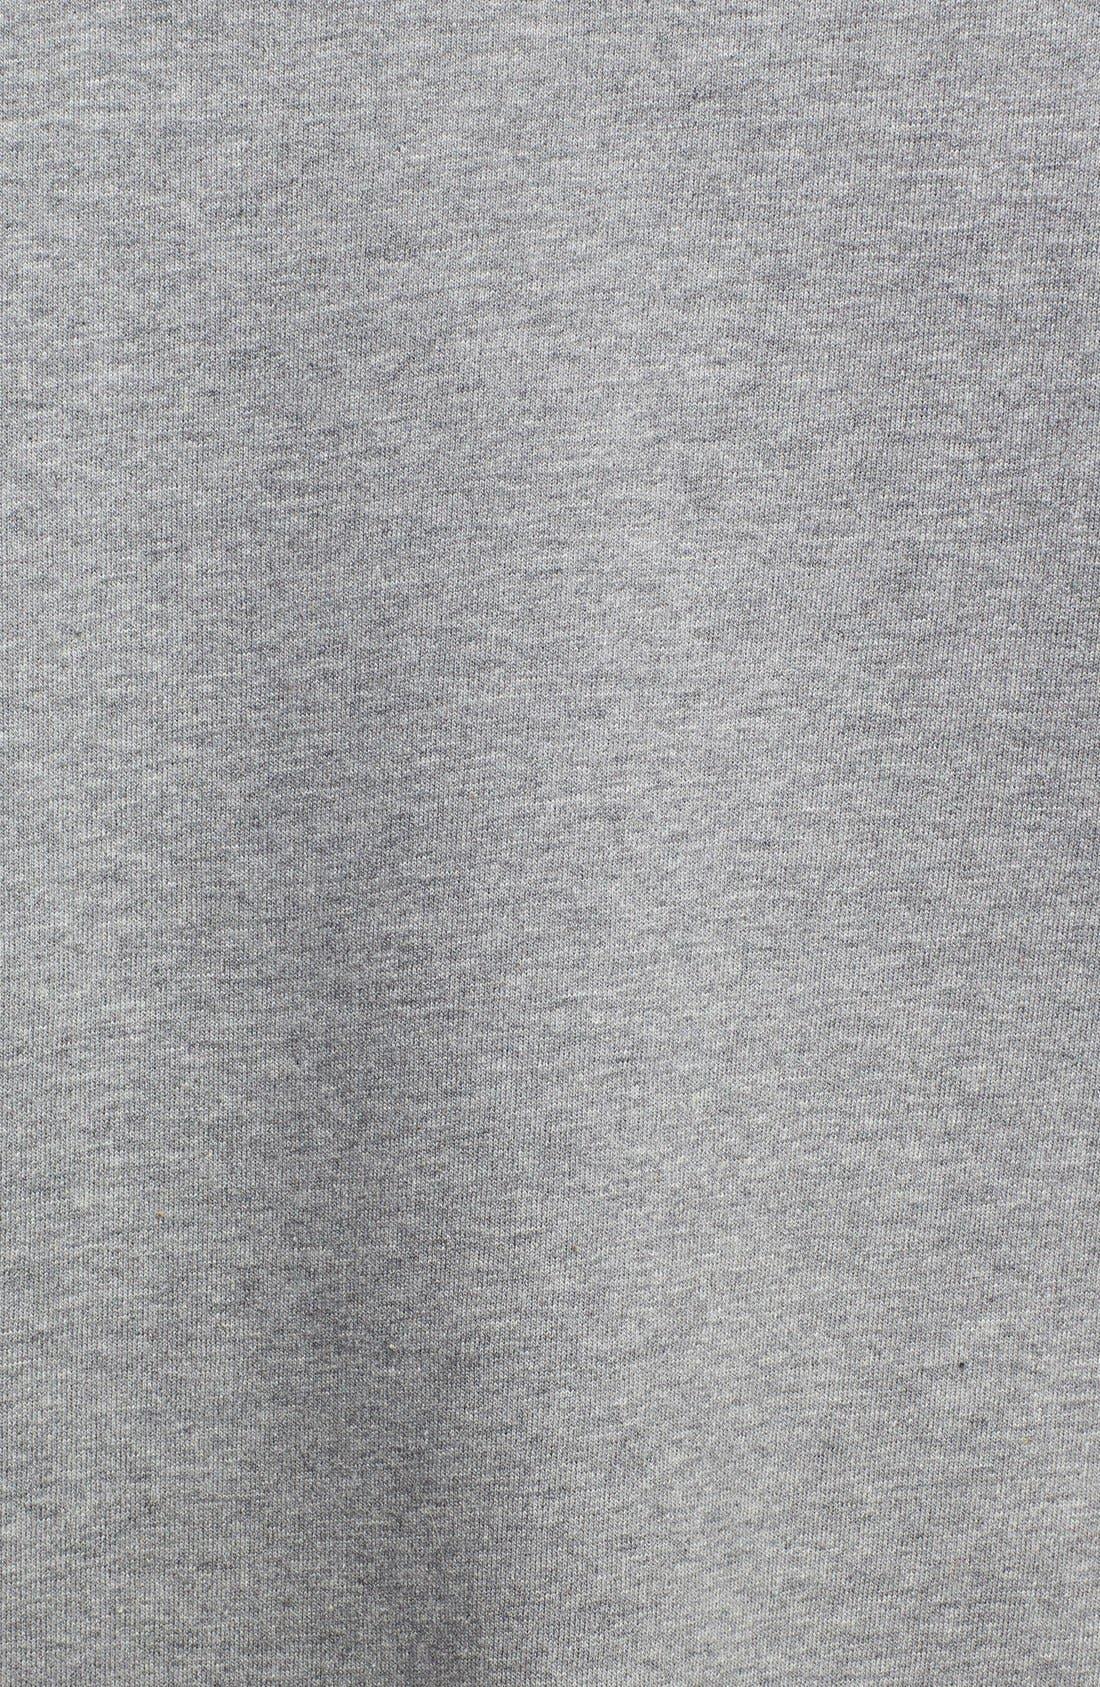 Alternate Image 3  - Two by Vince Camuto Embellished Raglan Sleeve Cotton Blend Sweatshirt